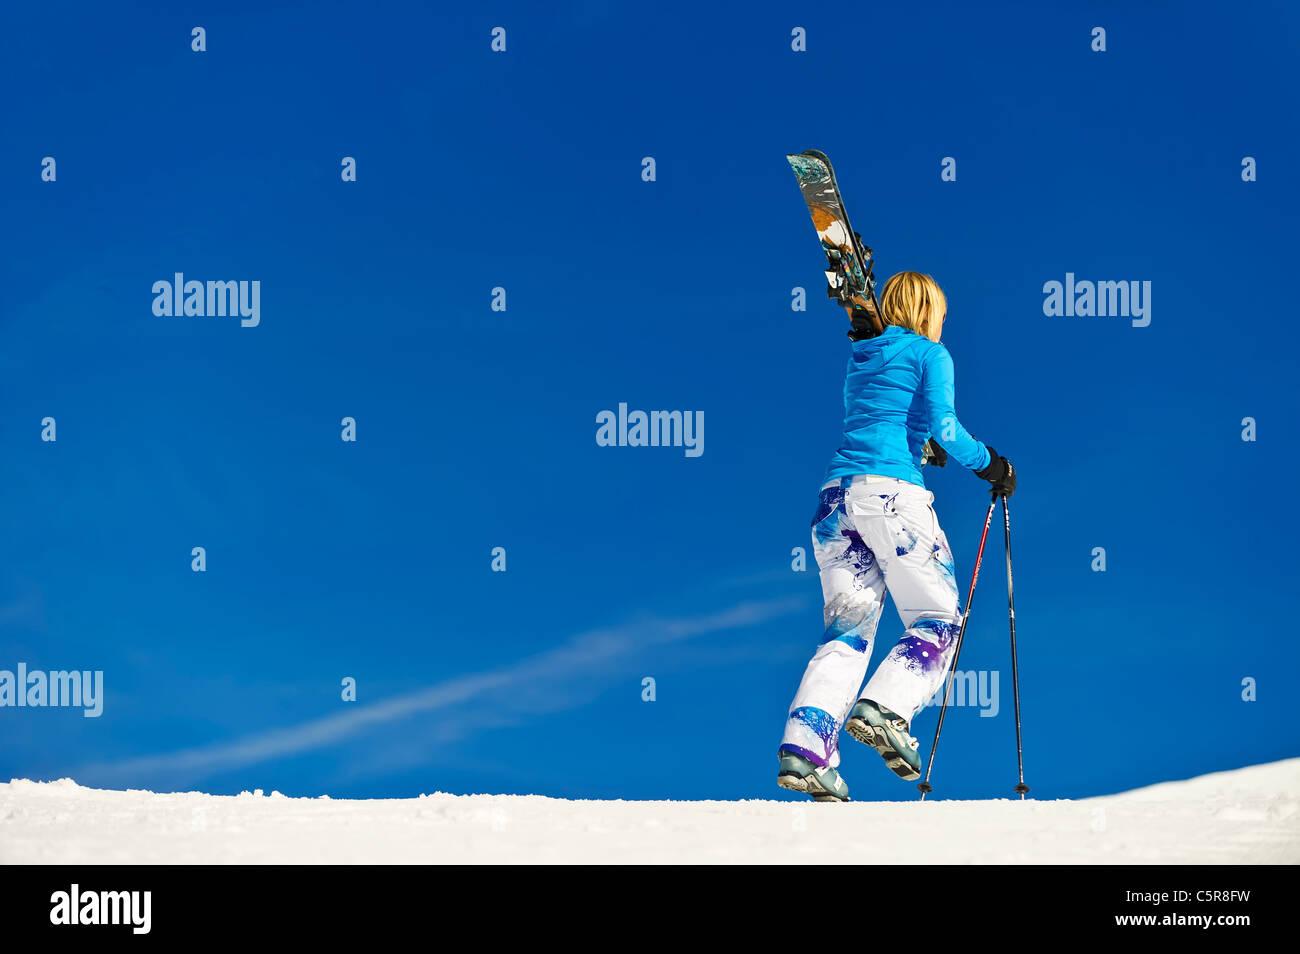 A female skier walking along the piste. - Stock Image